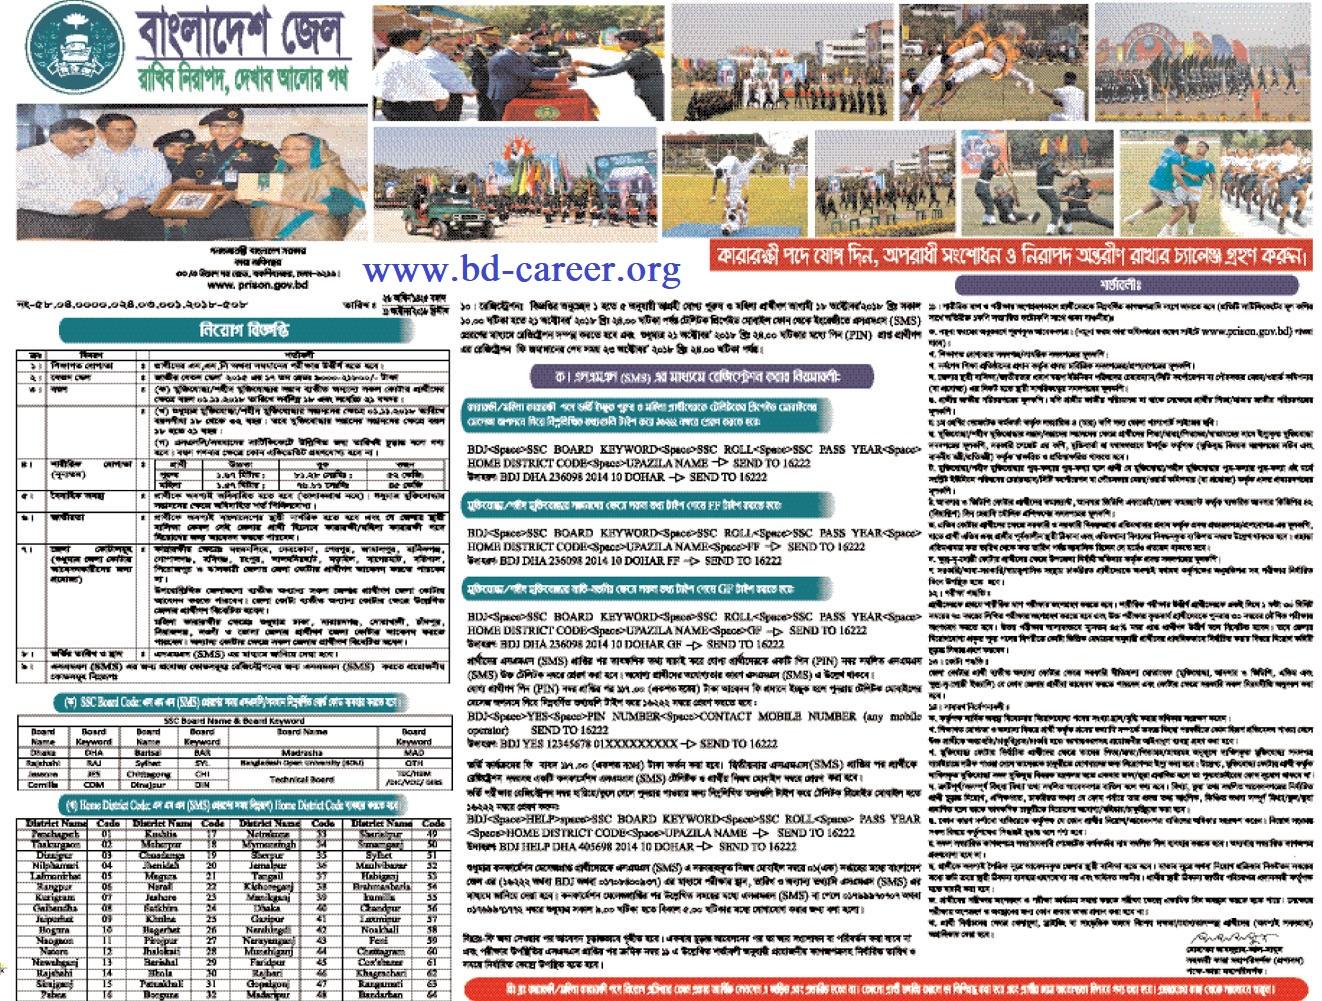 Bangladesh Jail Prison Job Circular -prison.gov.bd